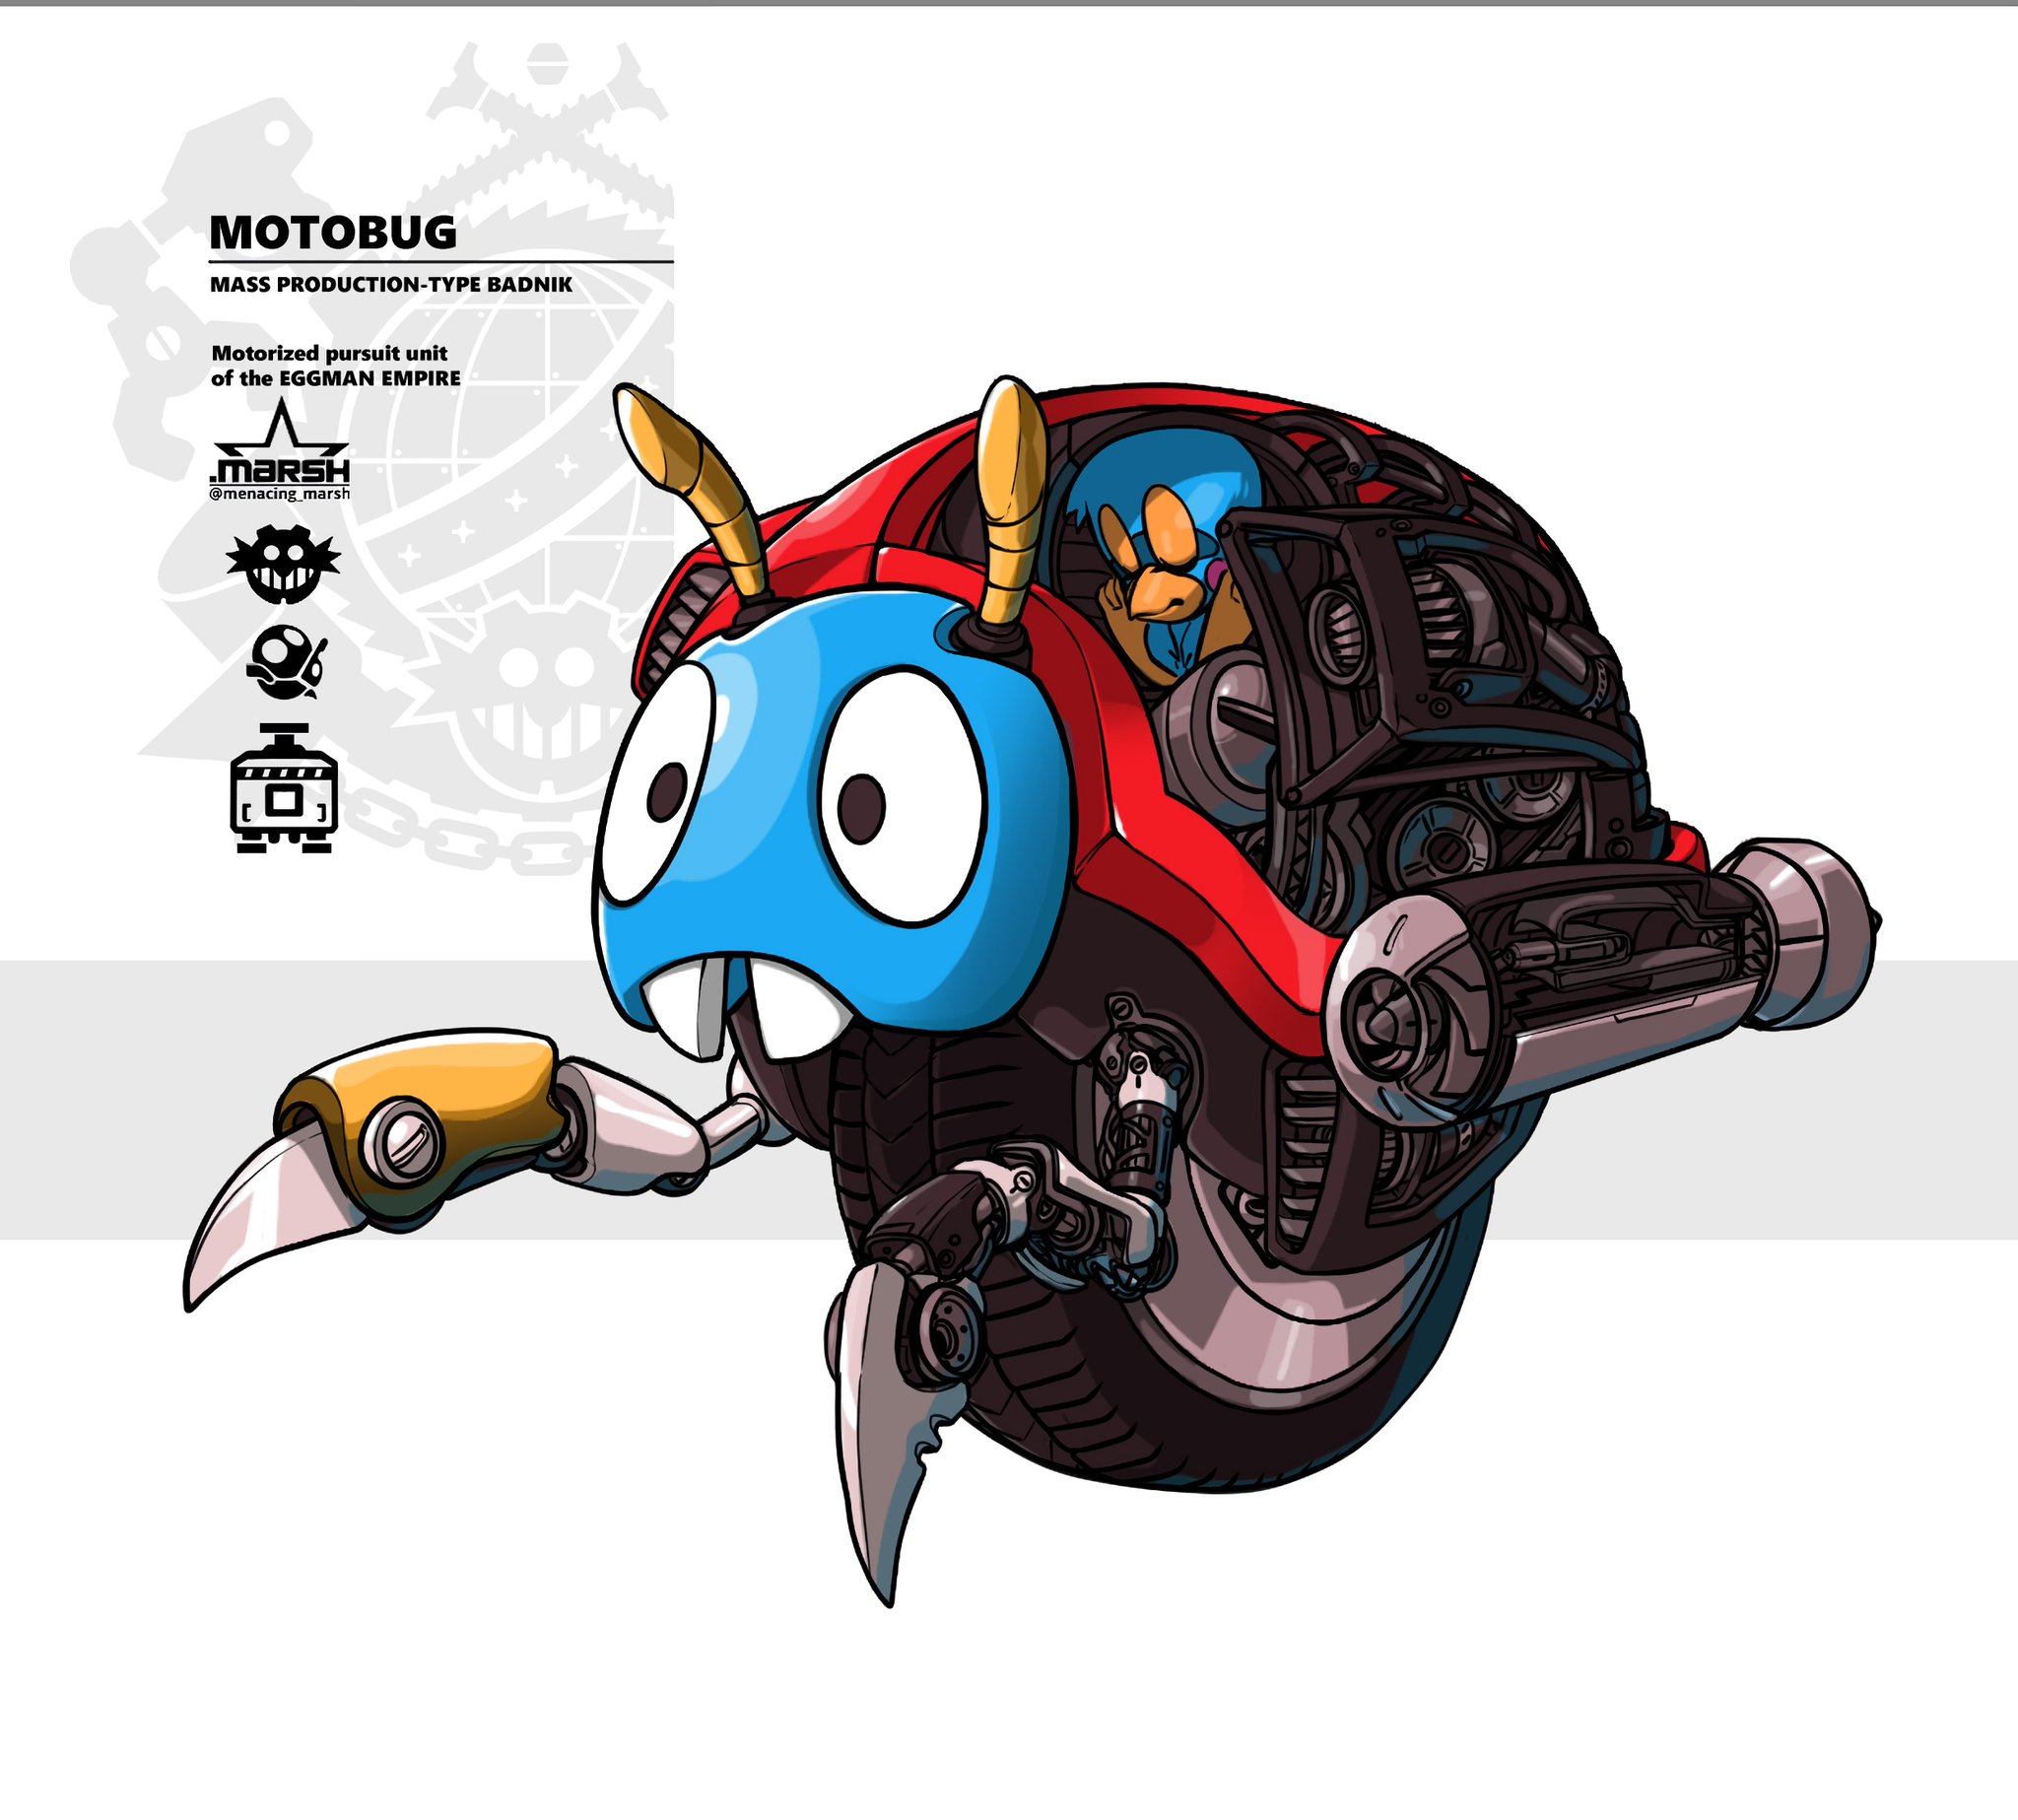 Motobug Interior Sonic The Hedgehog Know Your Meme